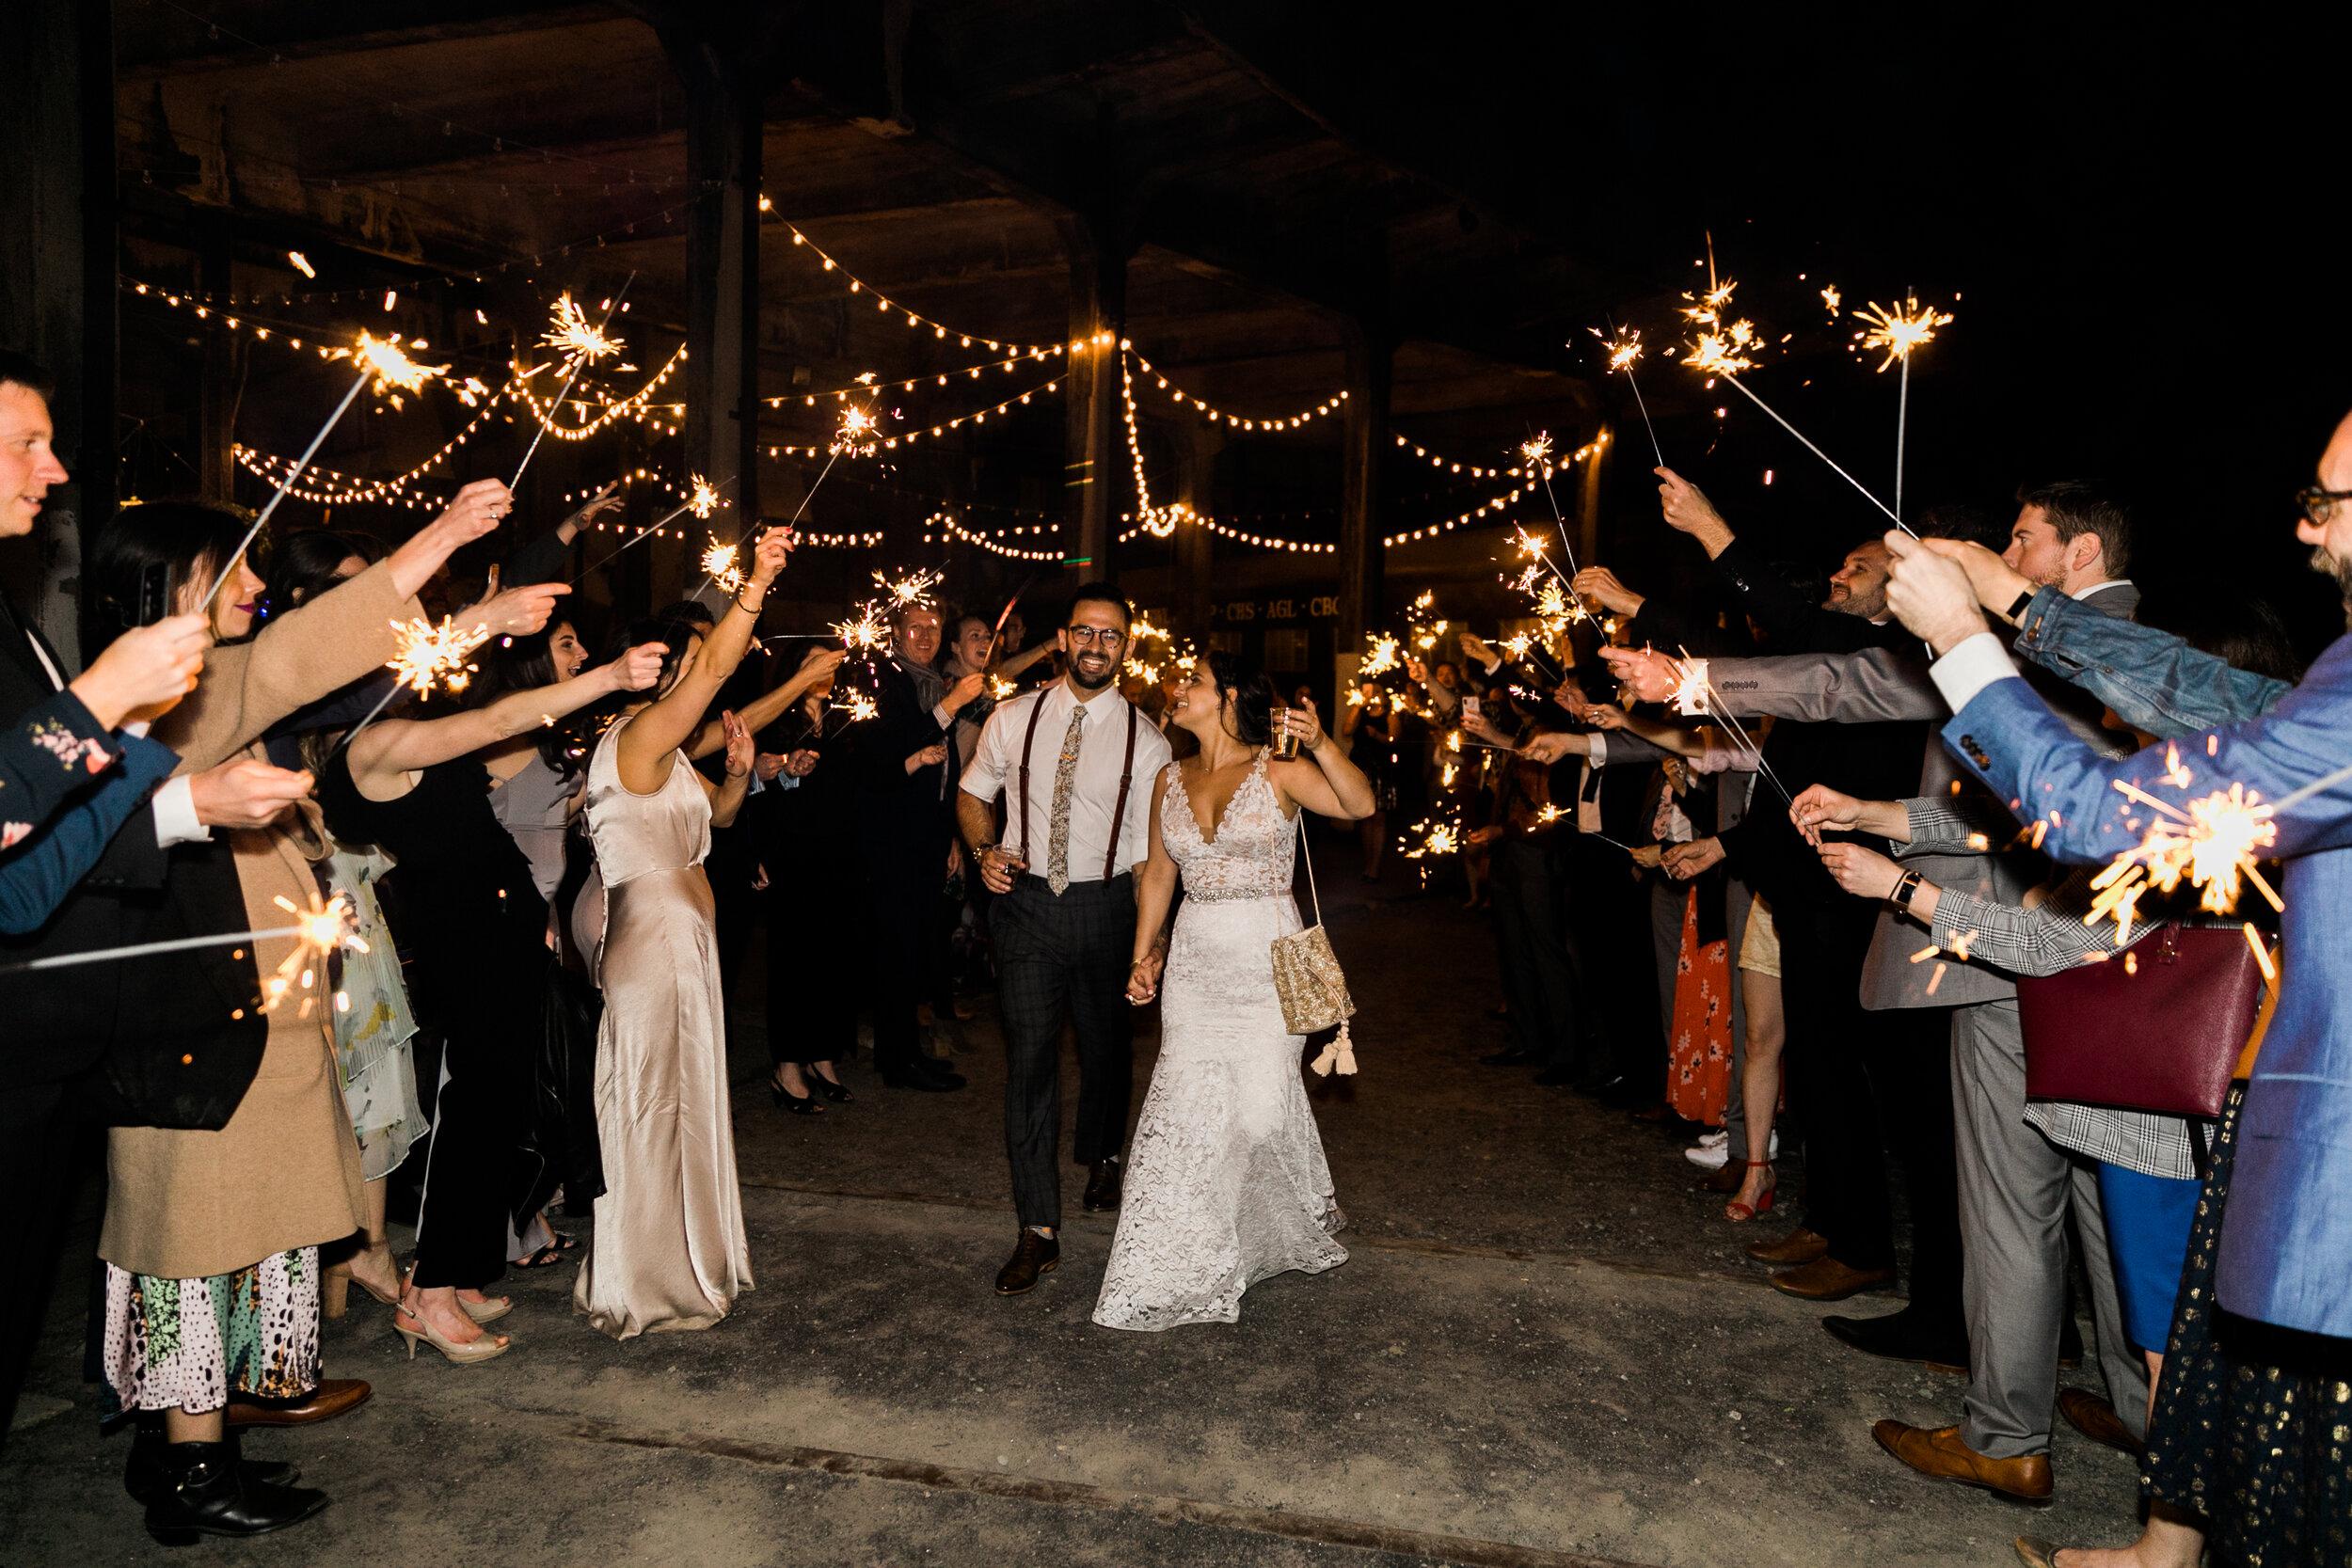 ivory-and-beau-blog-weddings-ivory-and-beau-couple-dominique-and-andres-savannah-florist-wedding-planning-savannah-bridal-boutique-wedding-flowers-KIP_WEBERWEDDING_RAILROADMUSEUM-1877.JPG